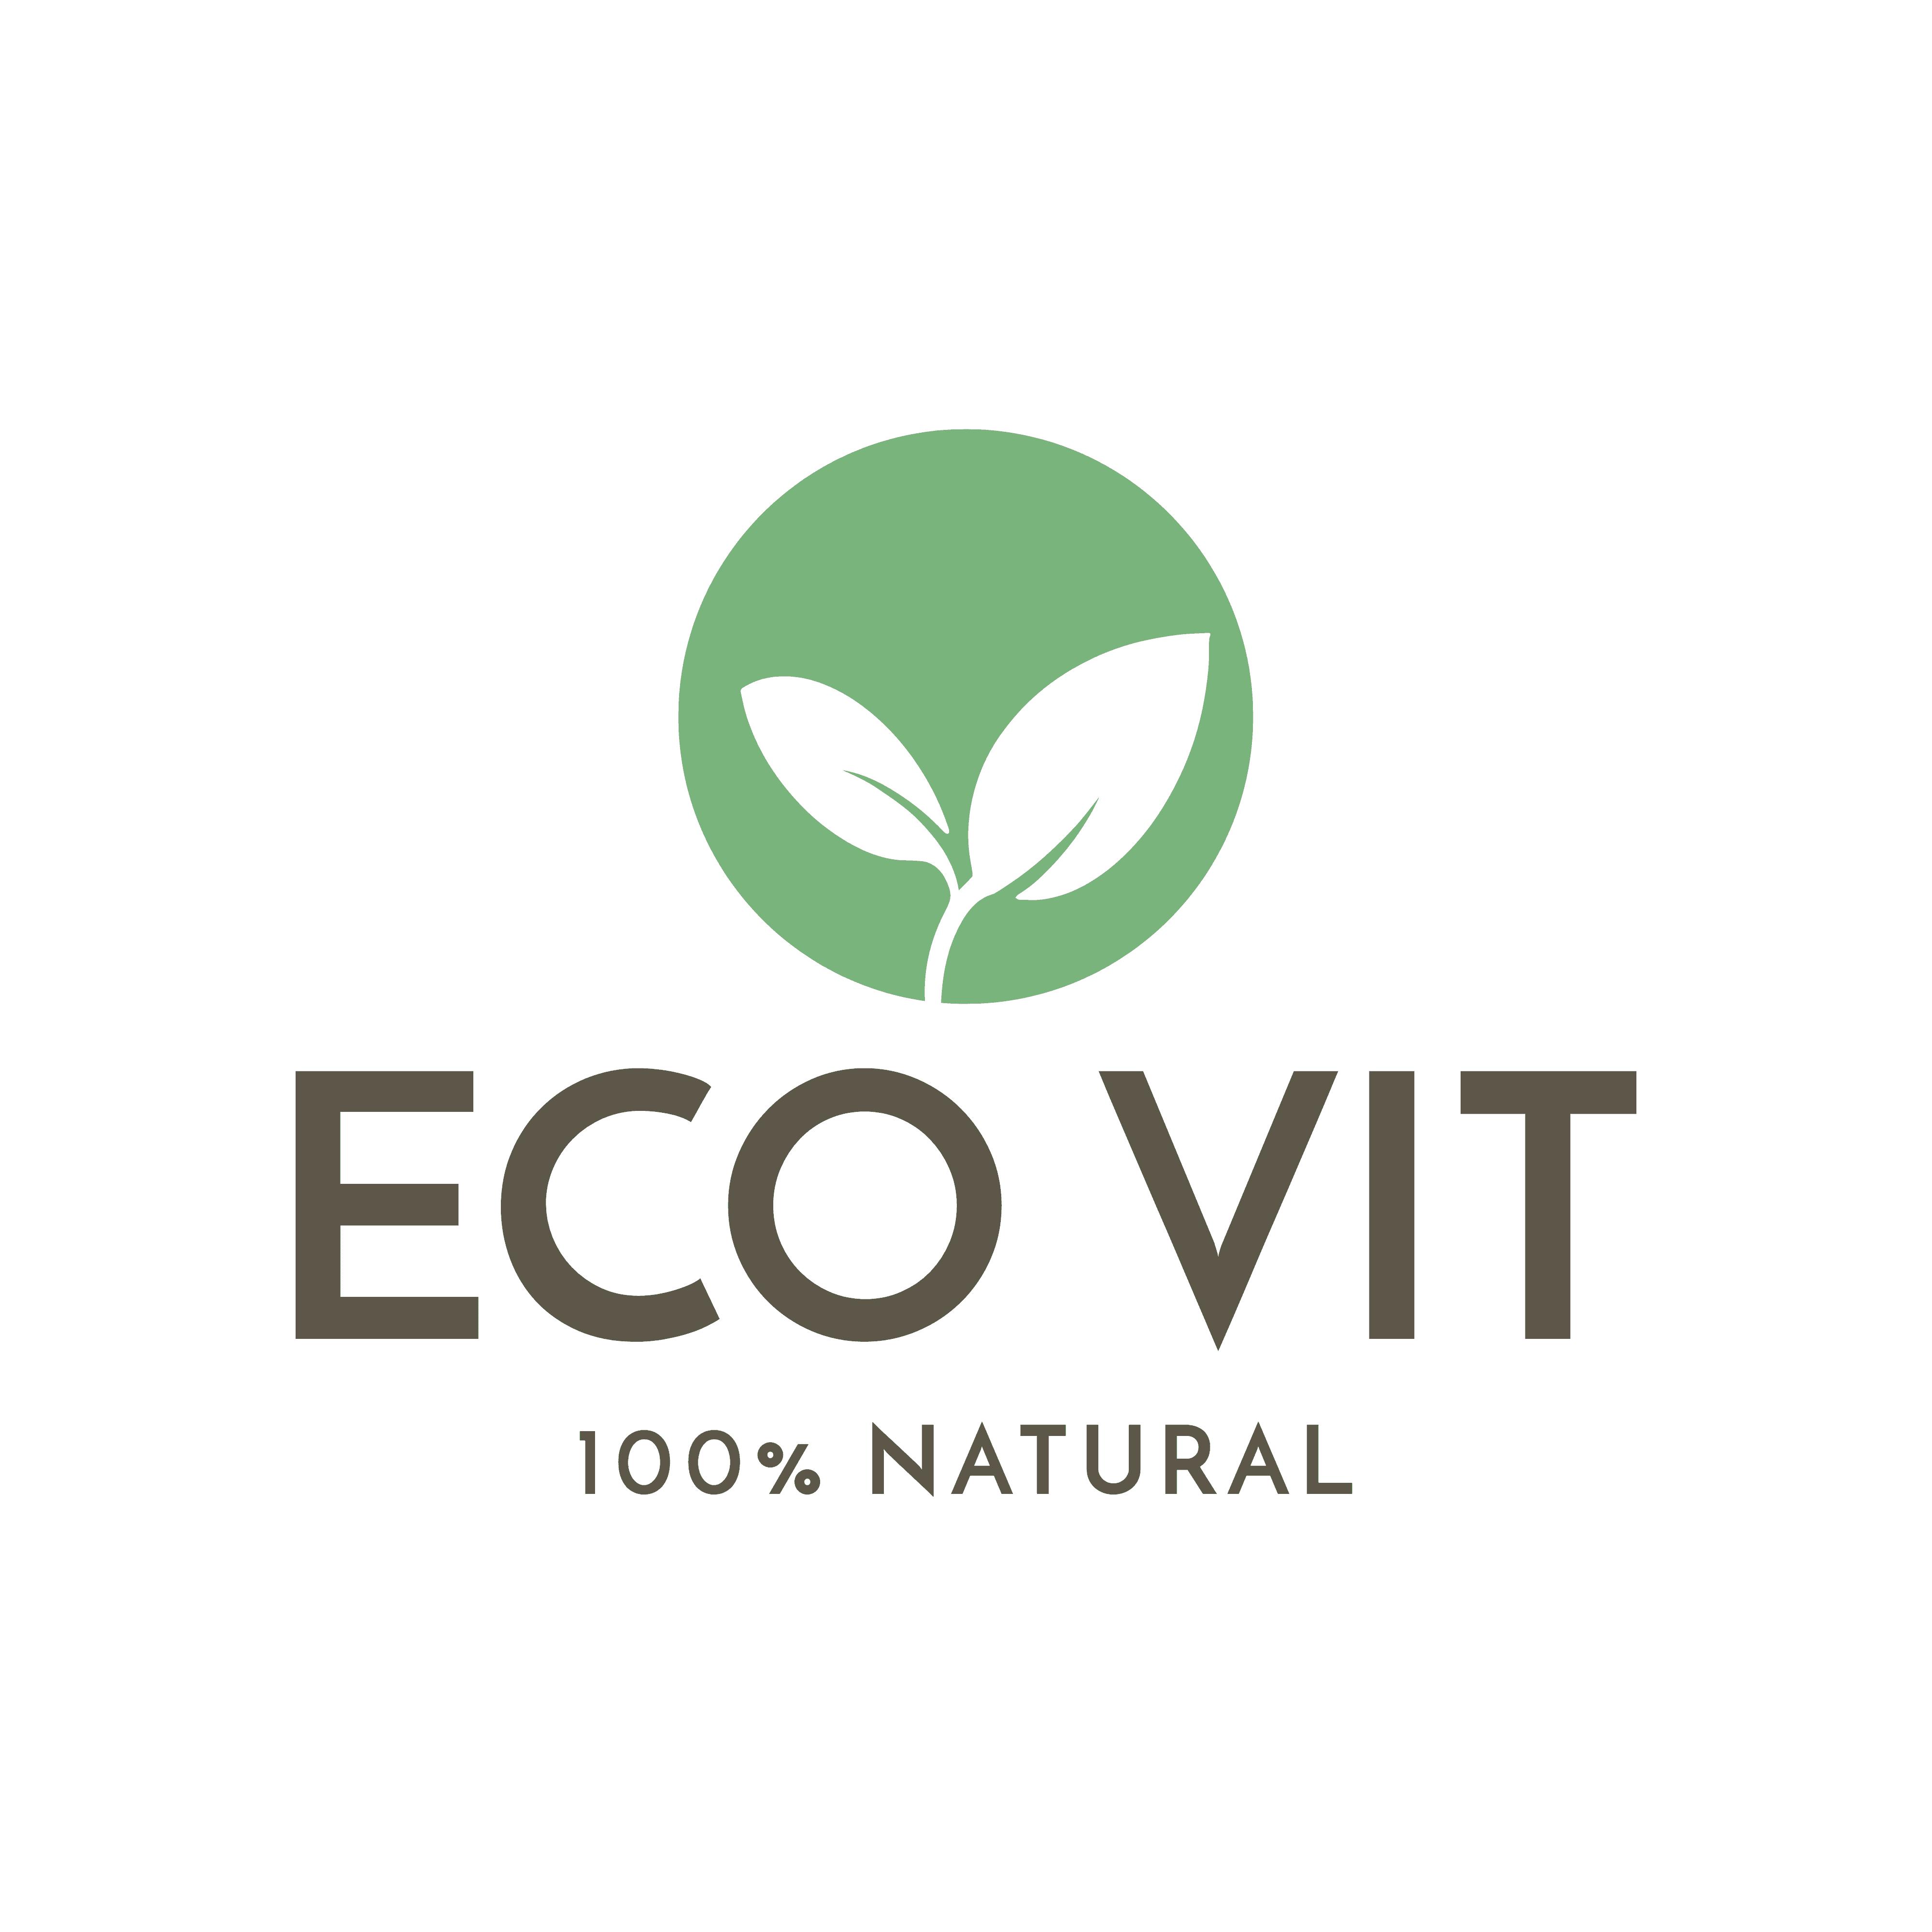 Ecovit